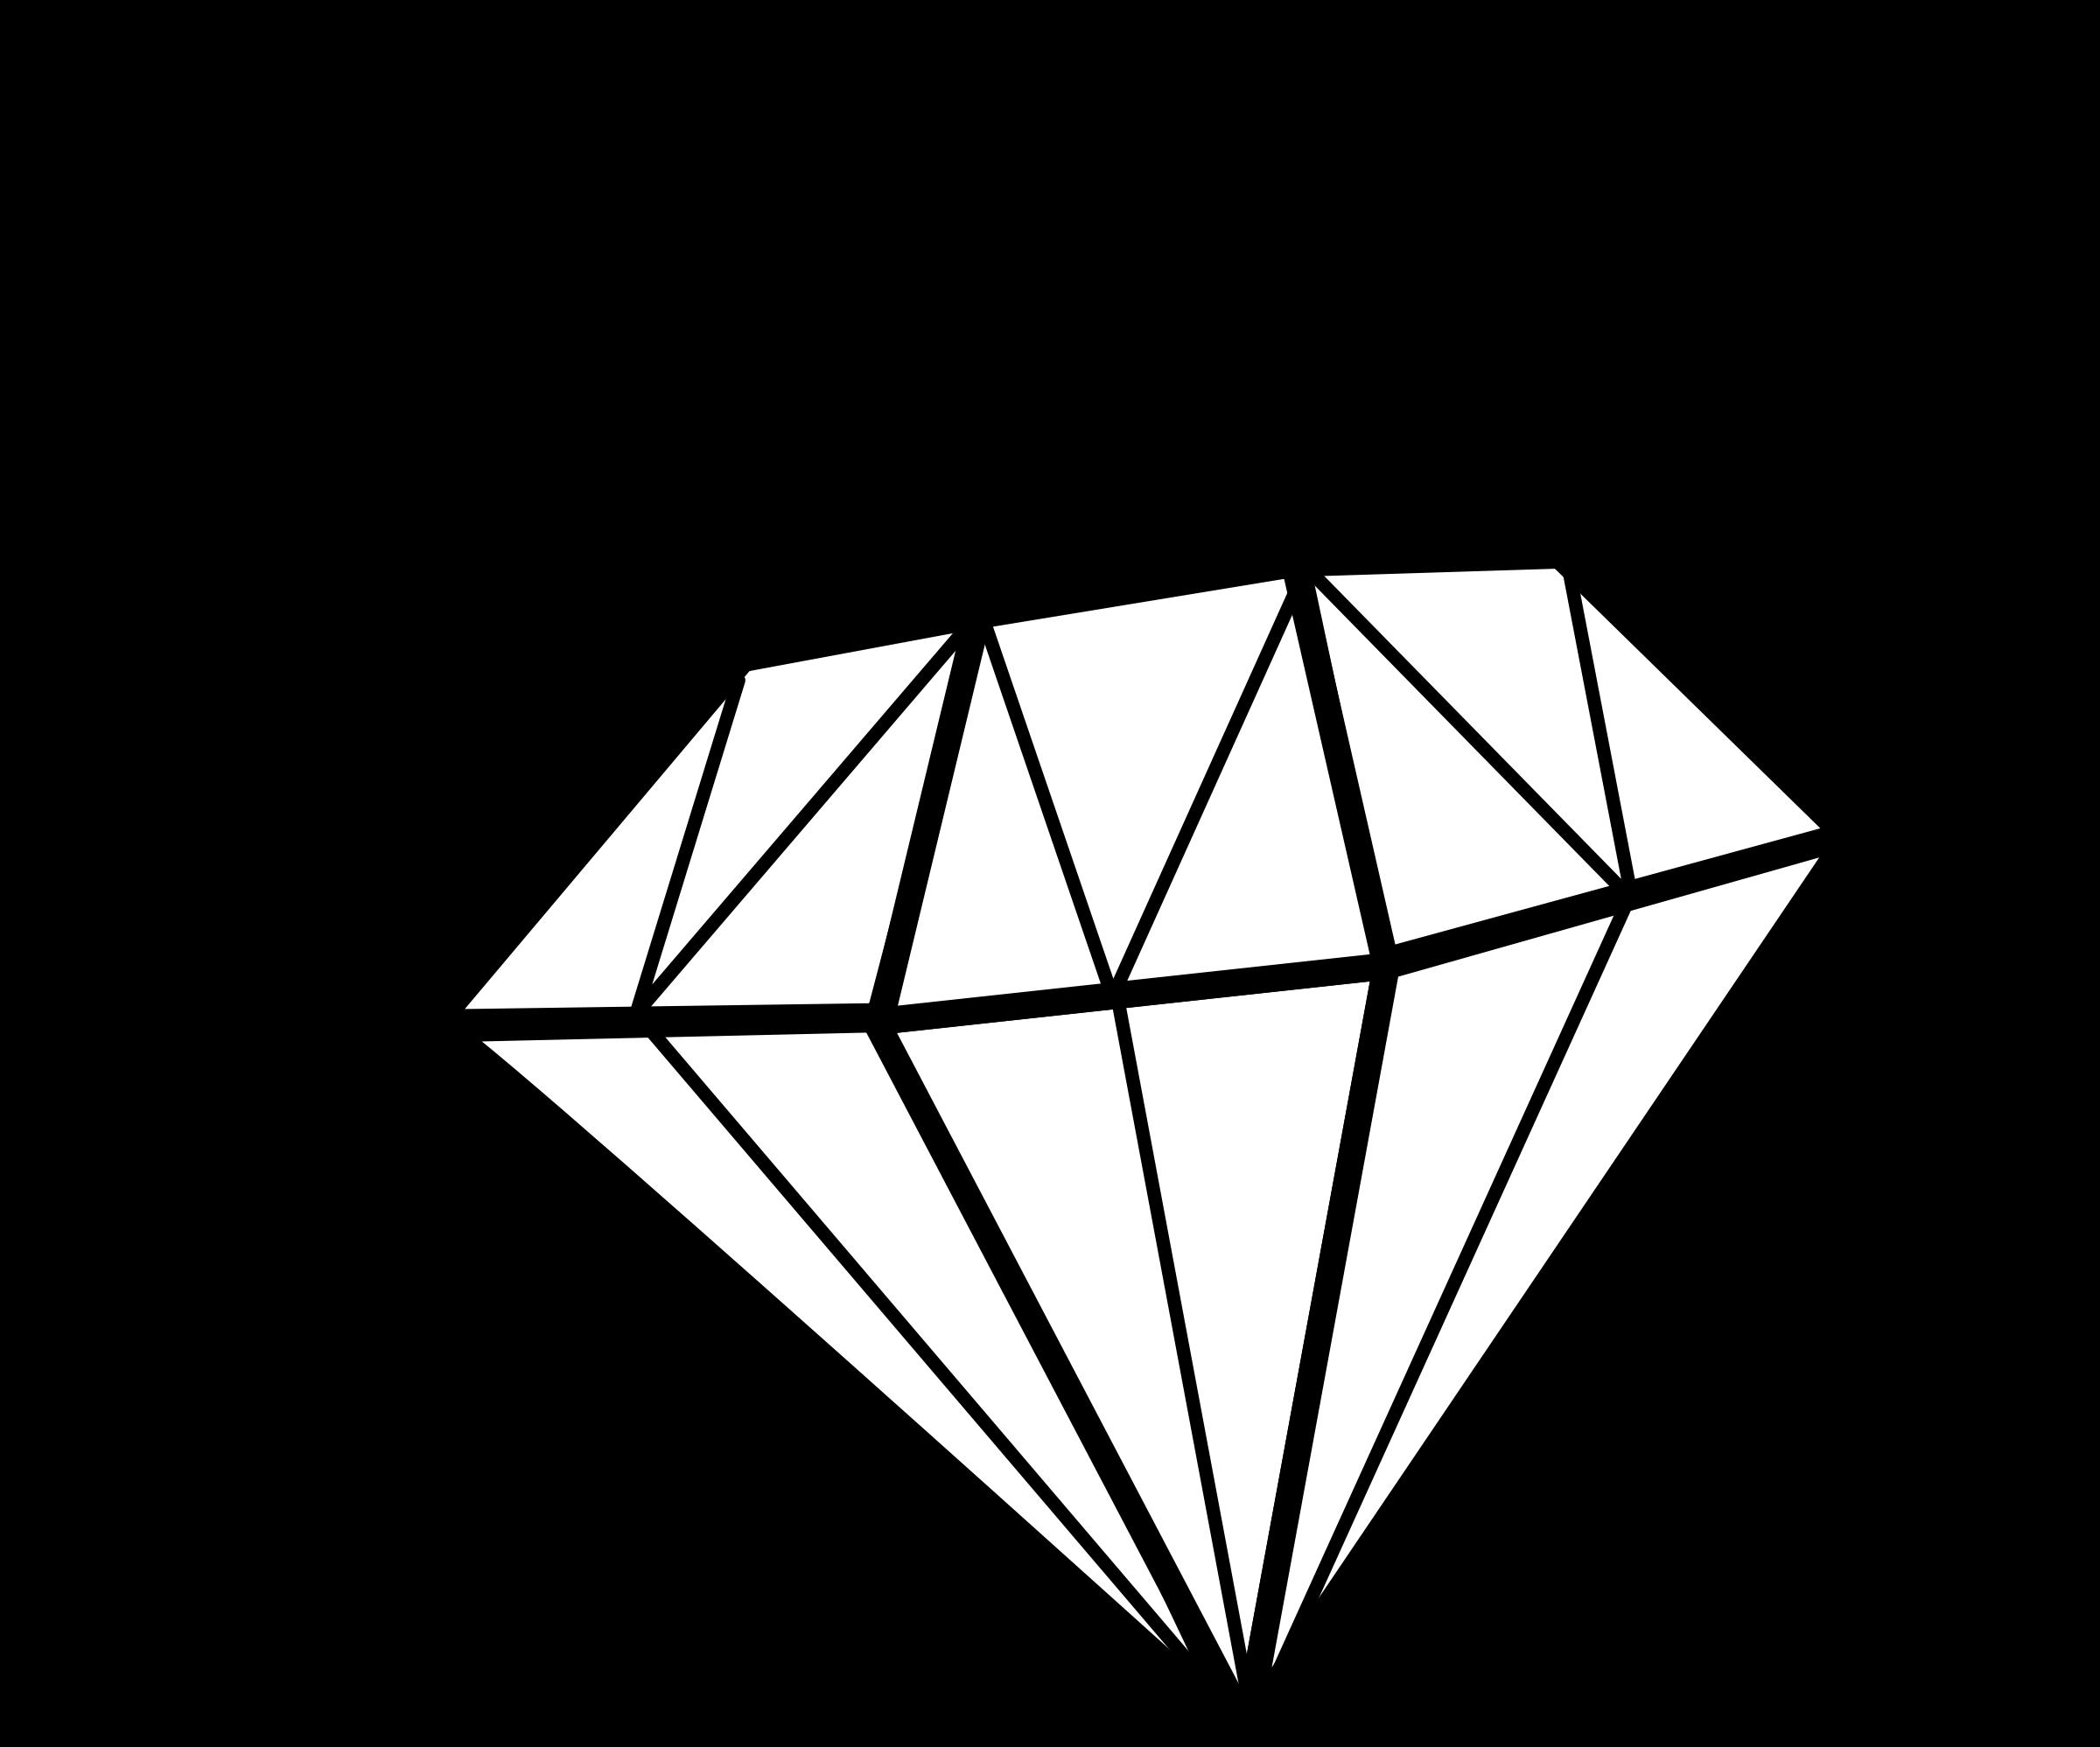 clipart diamond sparkling diamond